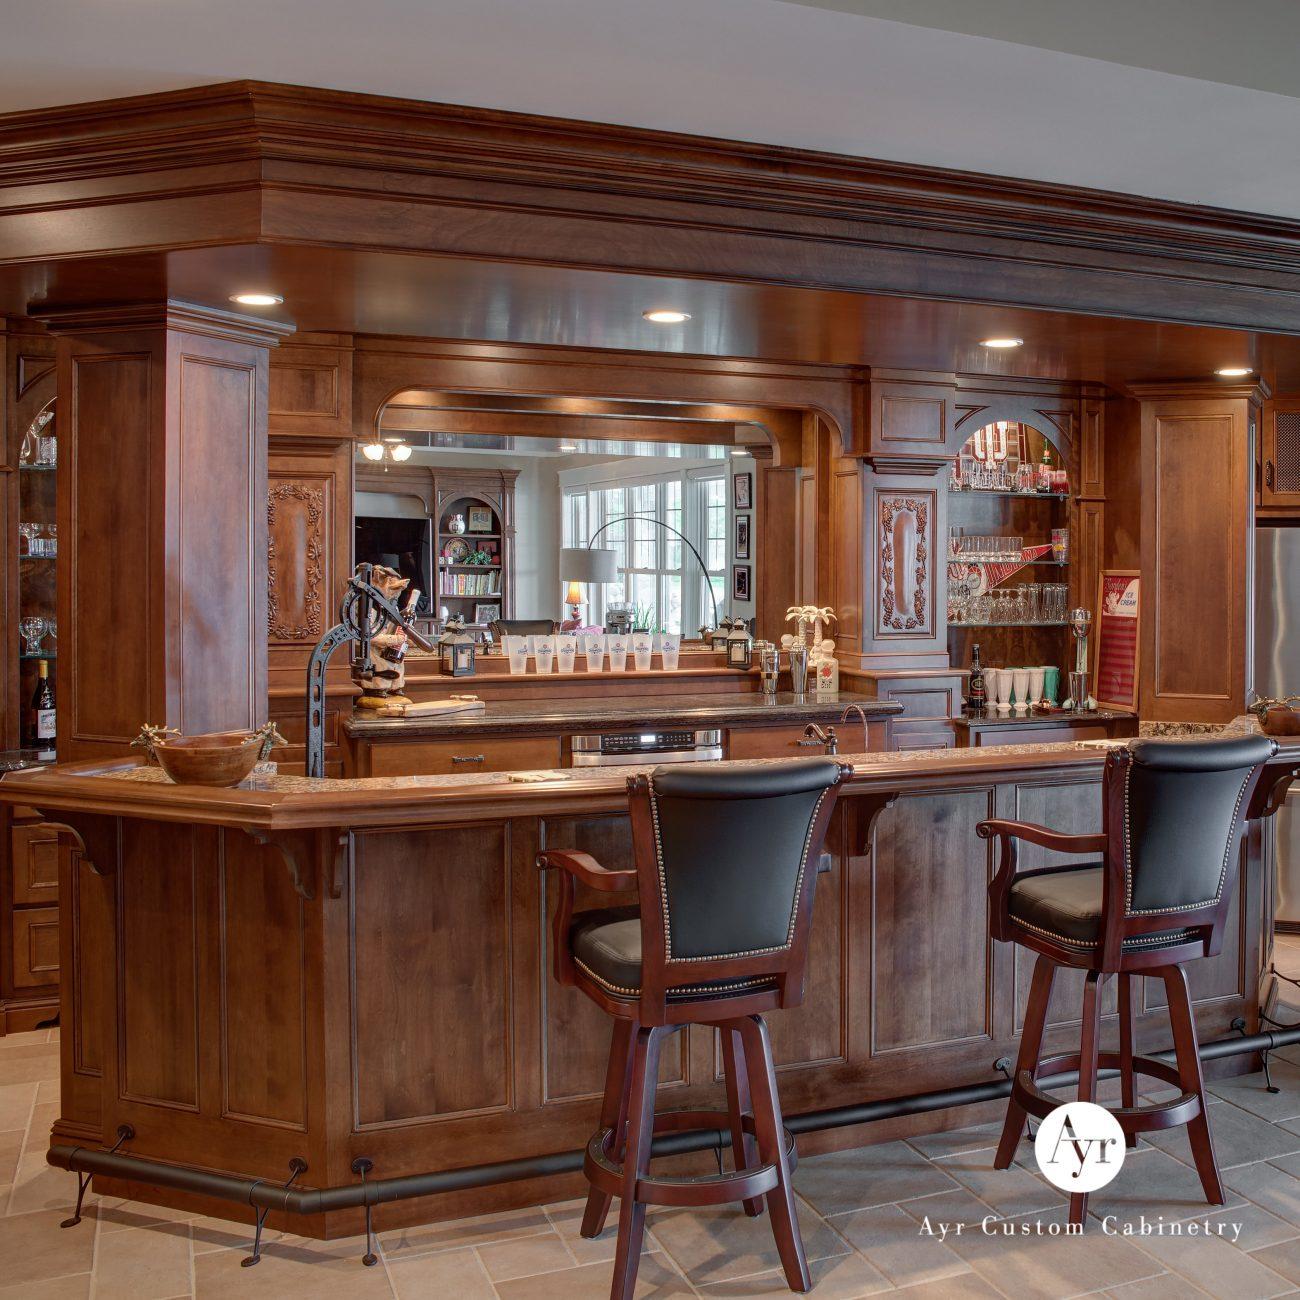 custom bar cabinets, product spotlight